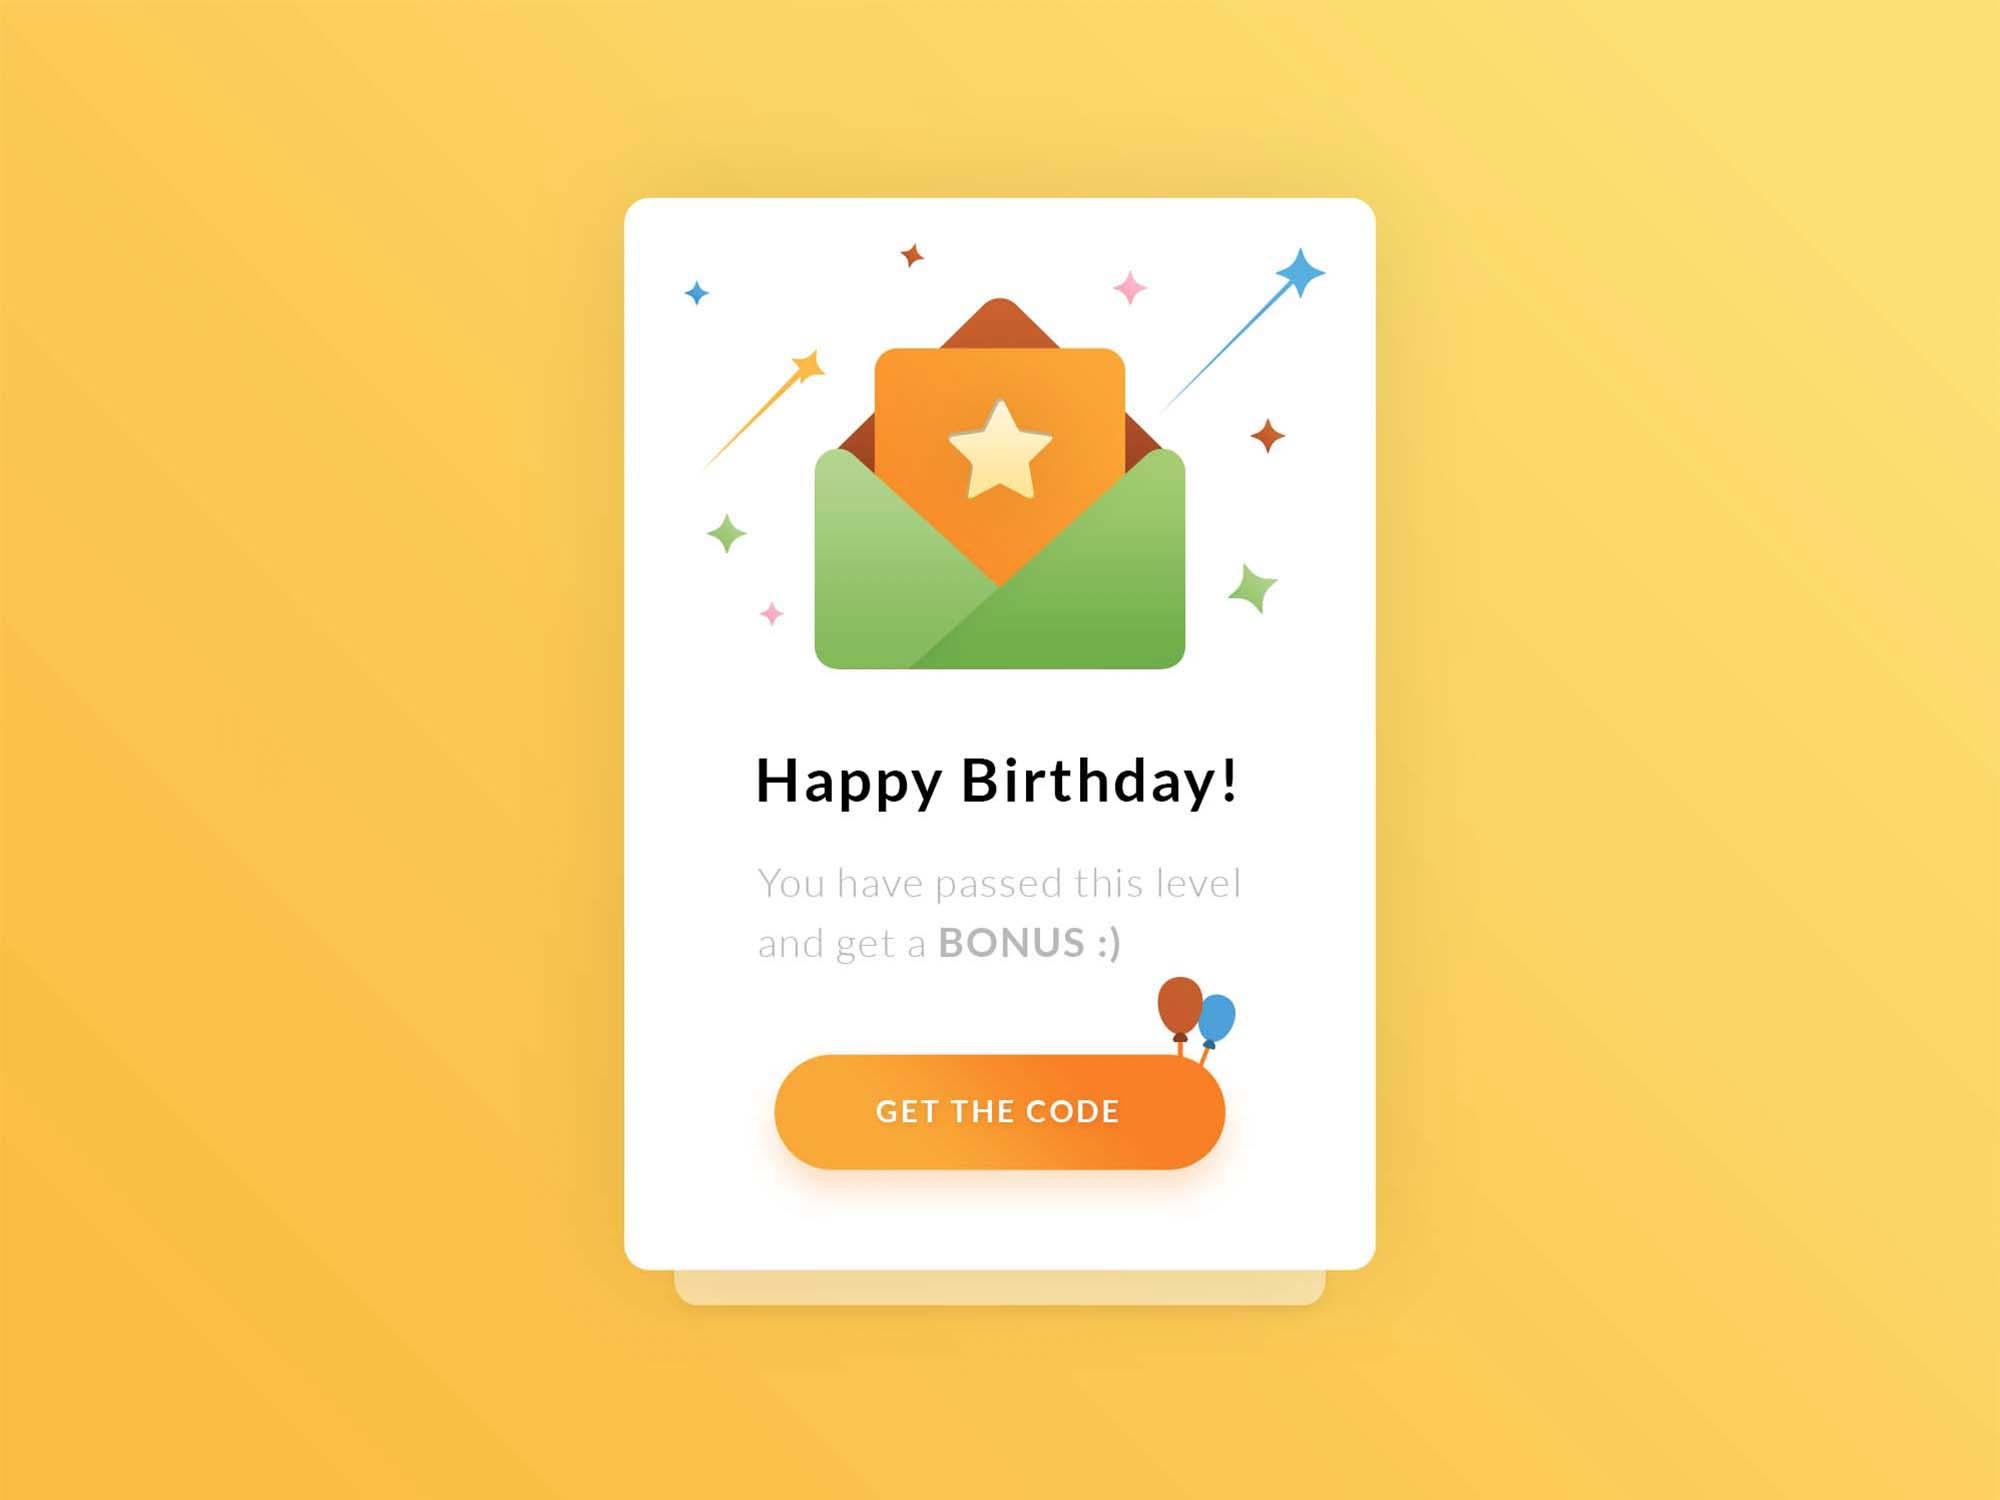 Happy Birthday UI-UX Template 2